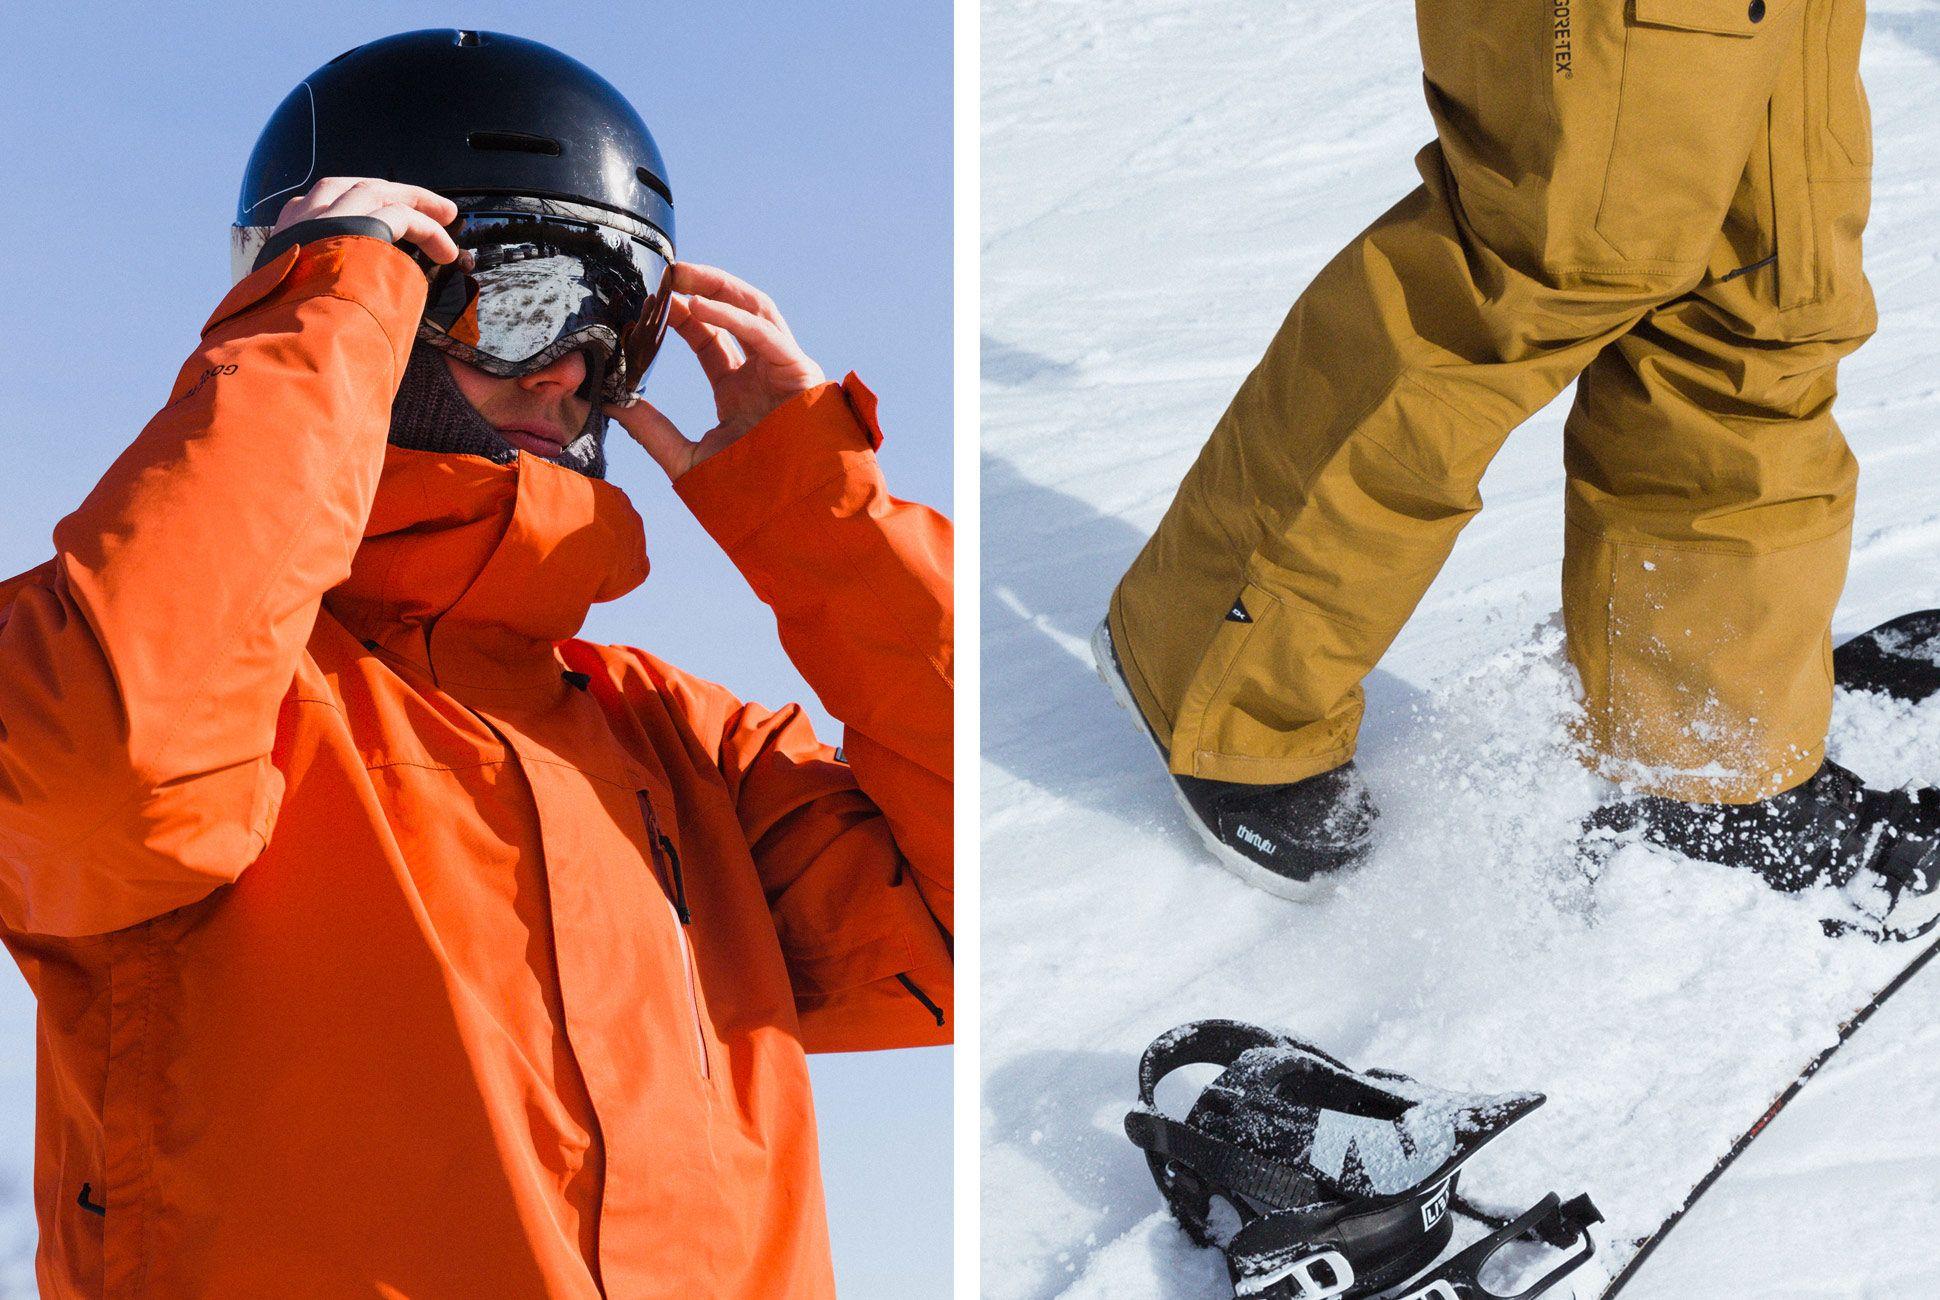 ultimate-ski-and-snow-gear-patrol-dakine-slide-4